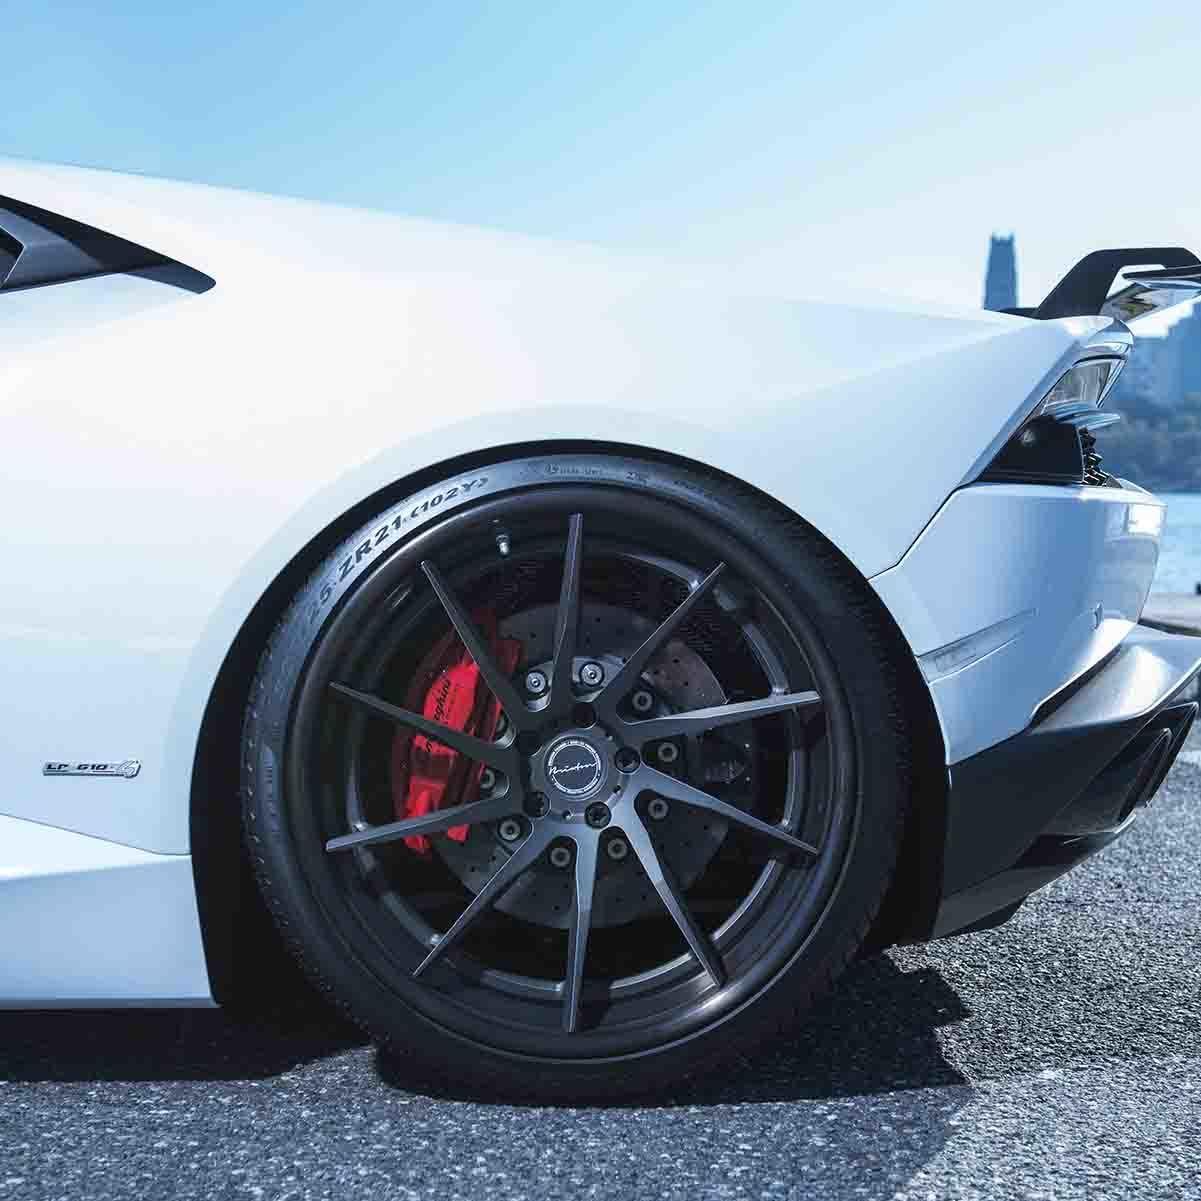 images-products-1-2793-232975081-brixton-forged-white-lamborghini-huracan-r10d-targa-brixton-forged-wheels.jpg